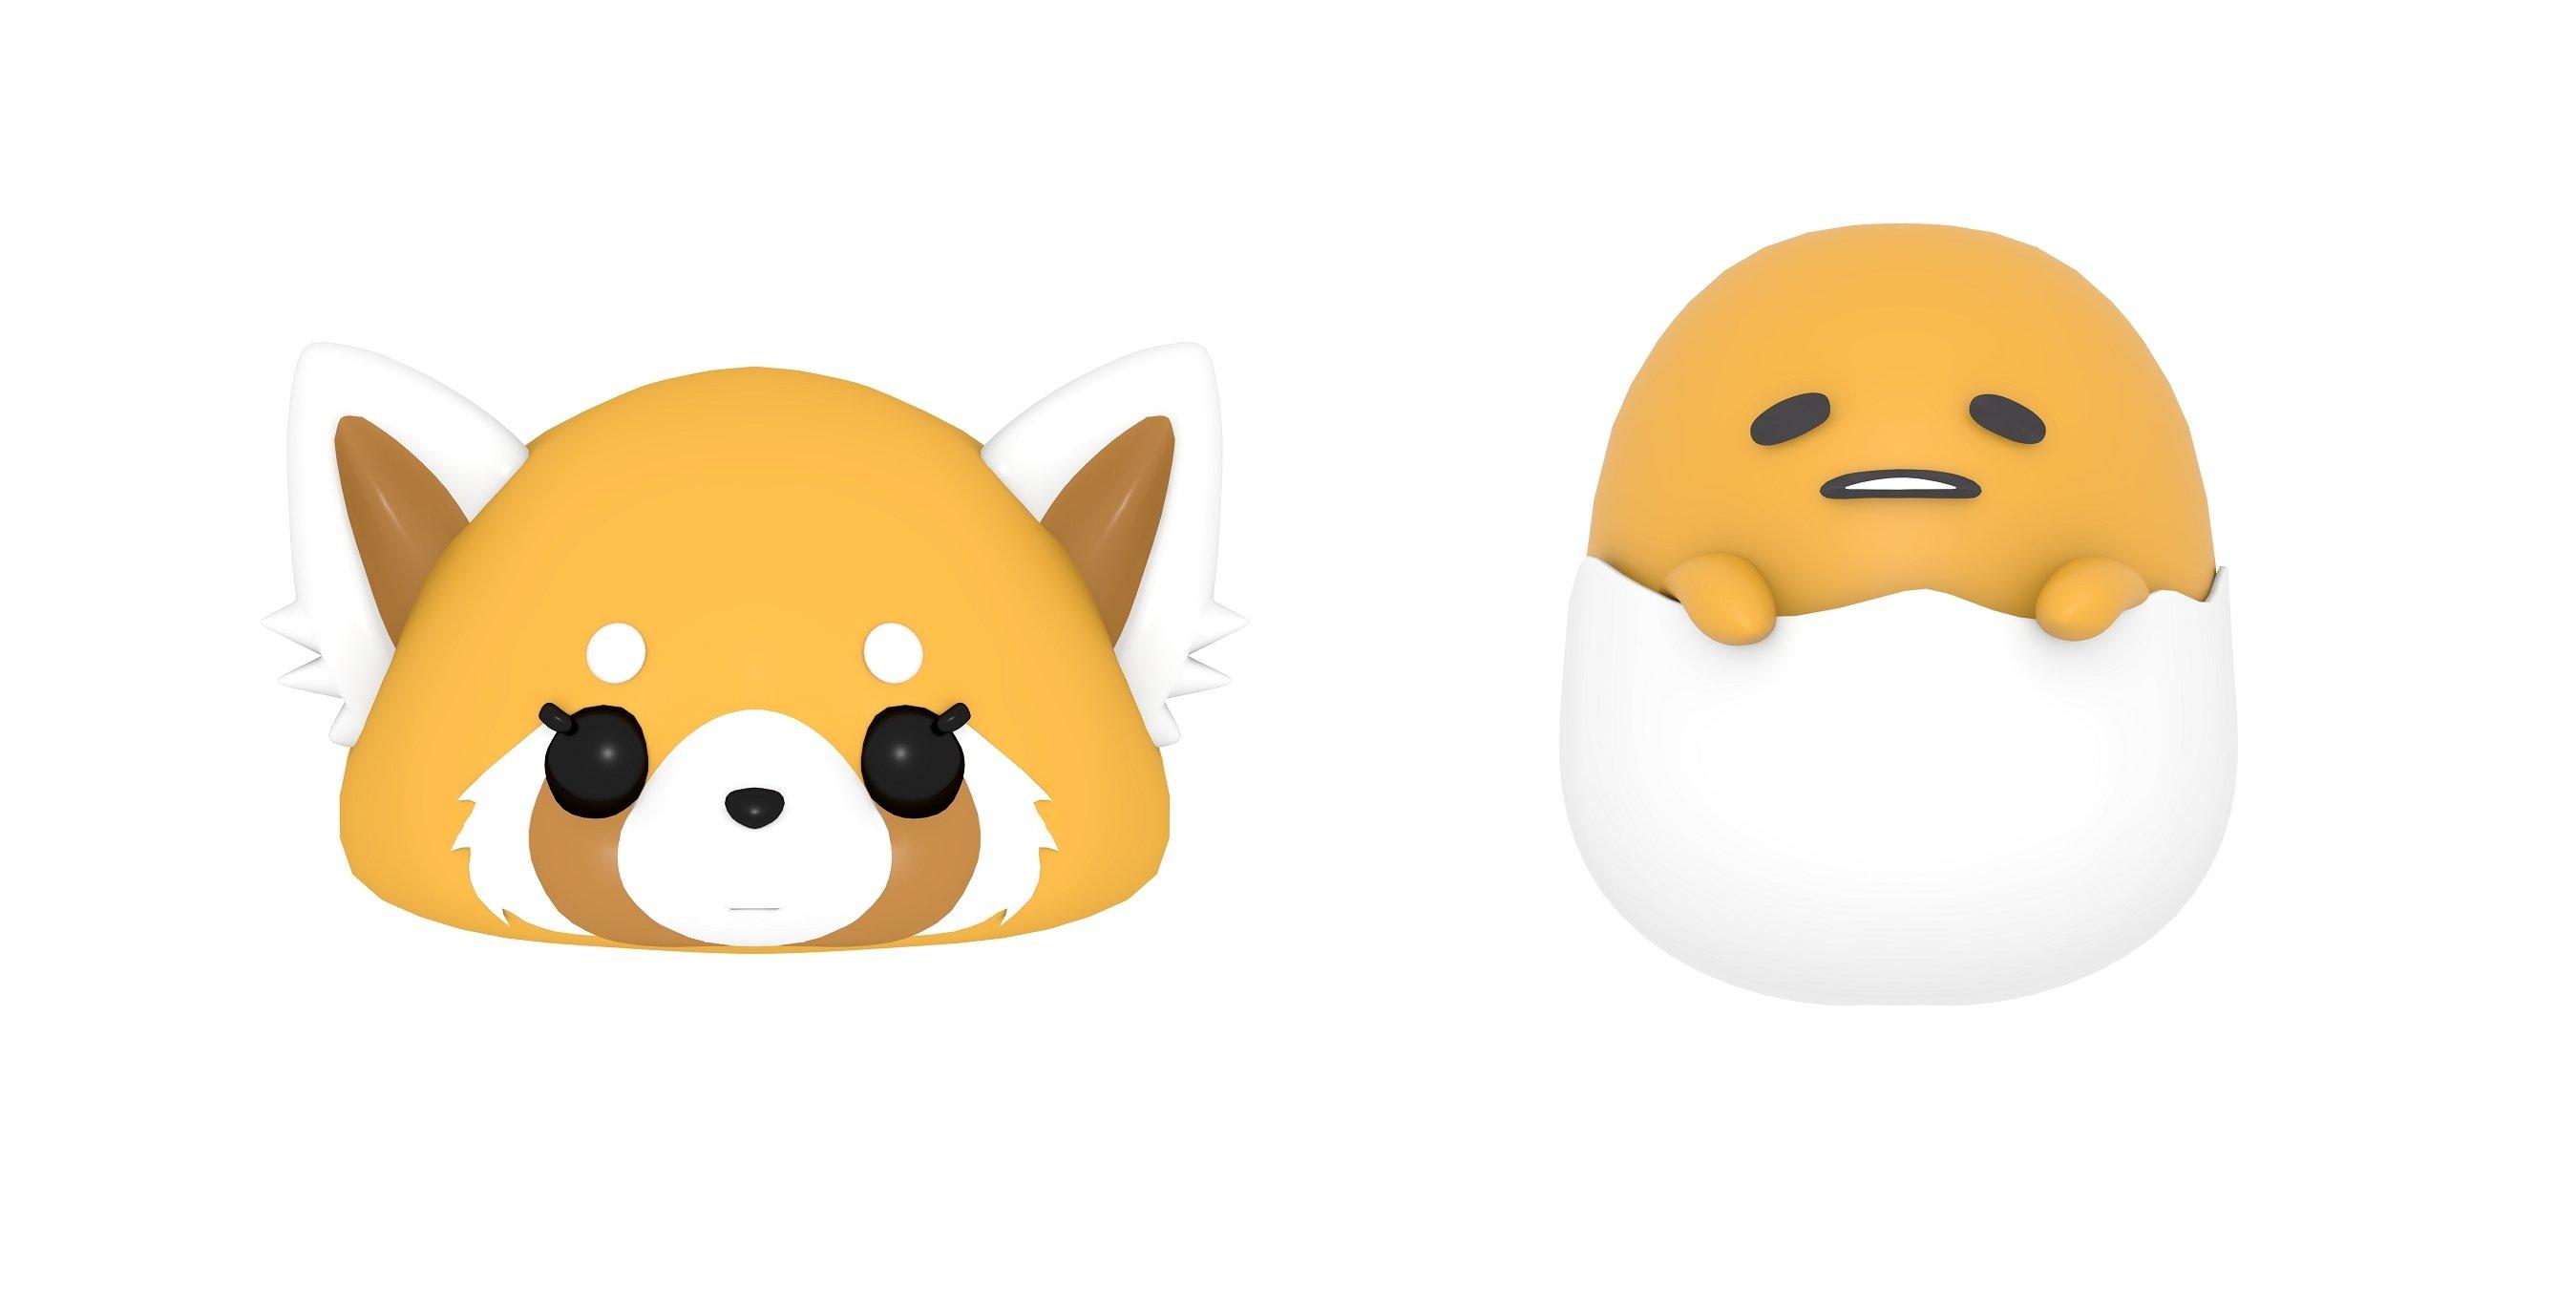 Gudetama emoji. Baidu s facemoji keyboard